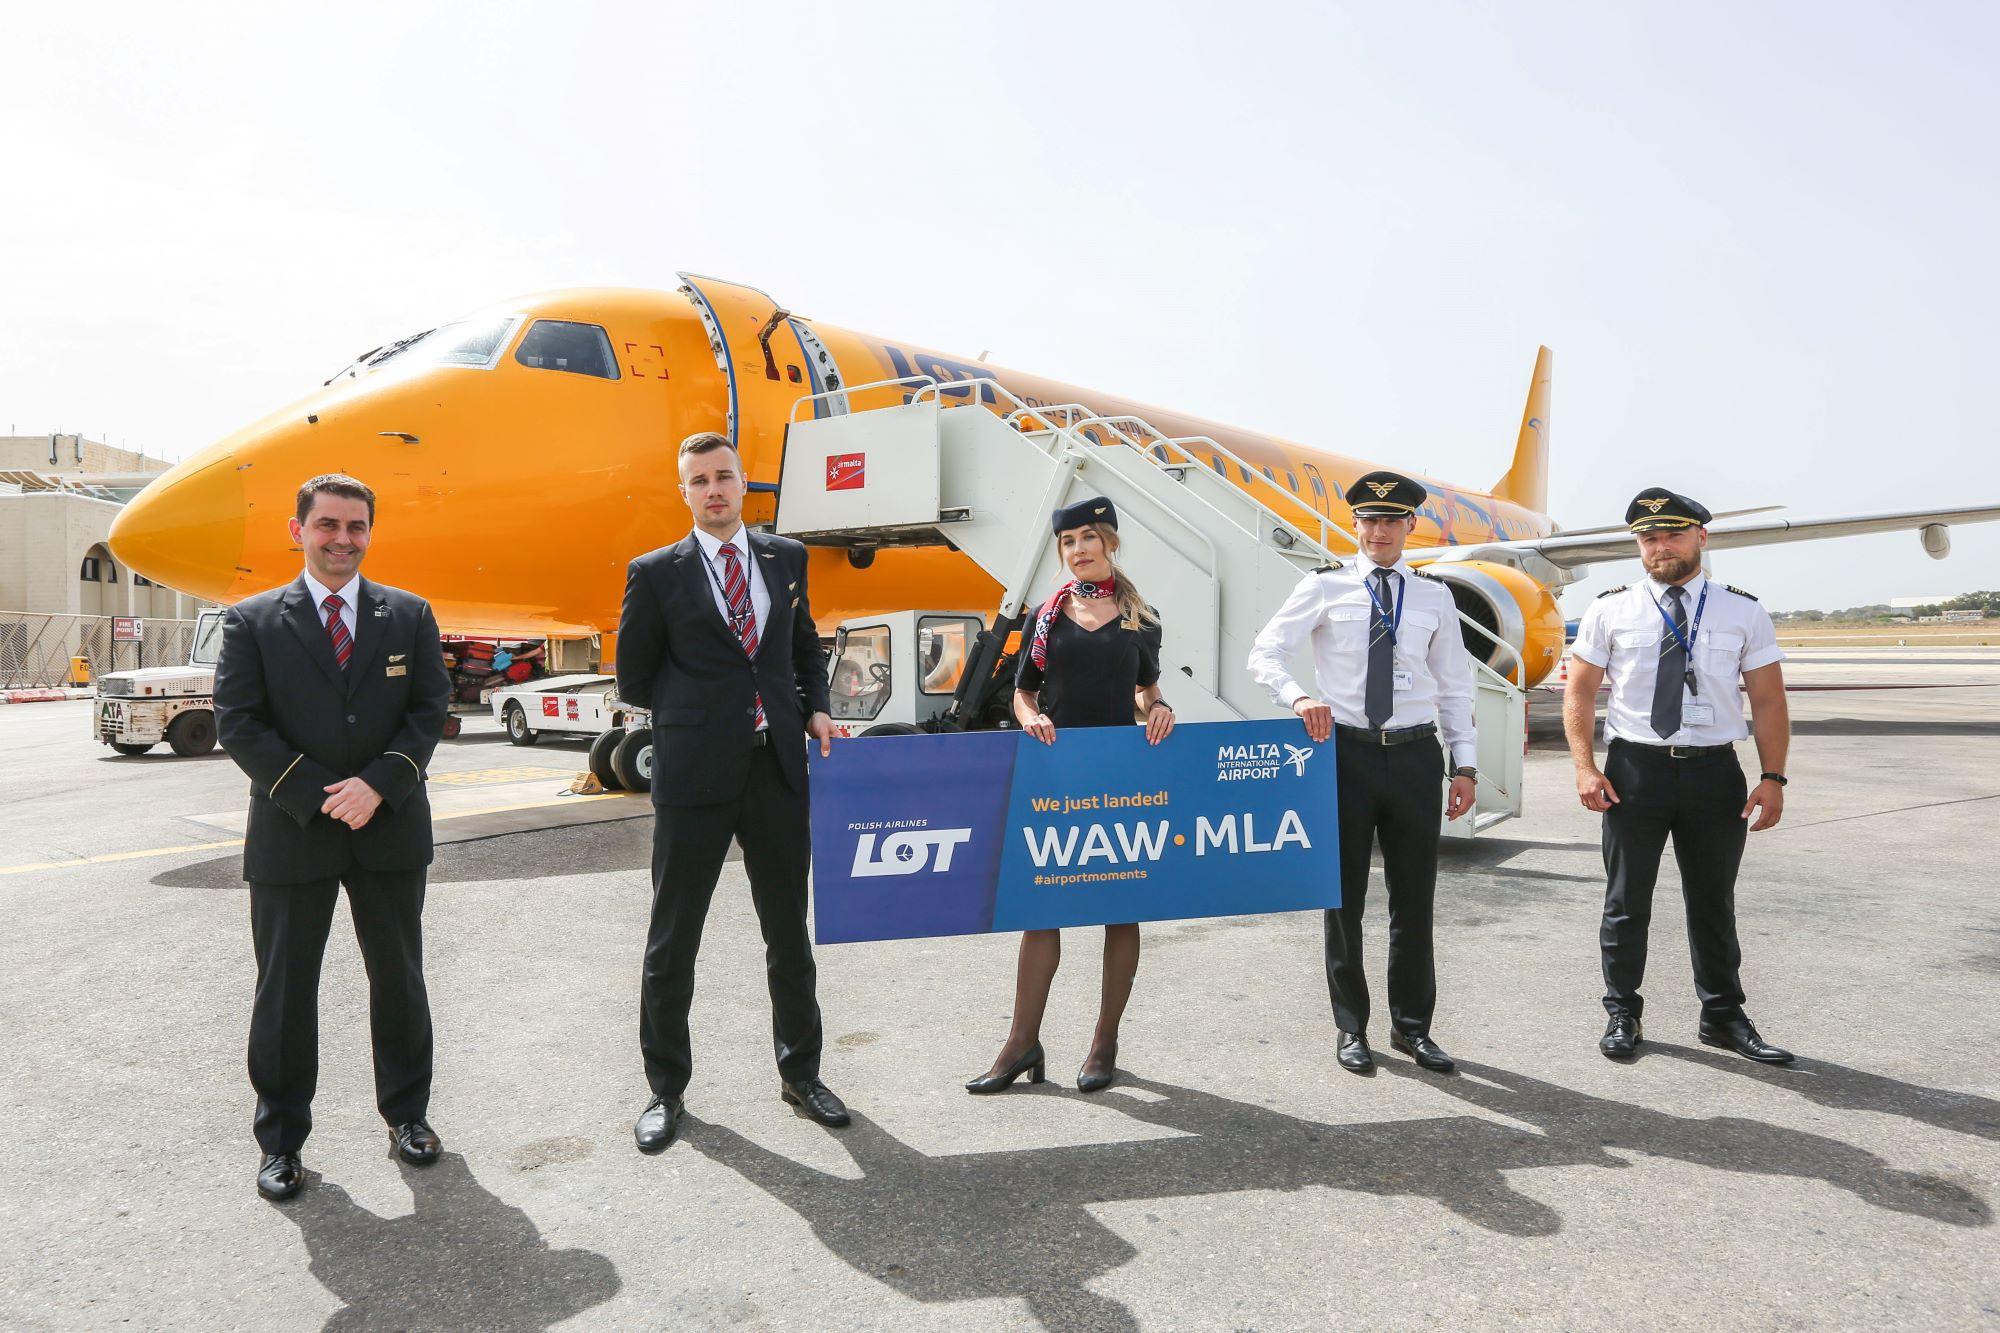 lot polish airline